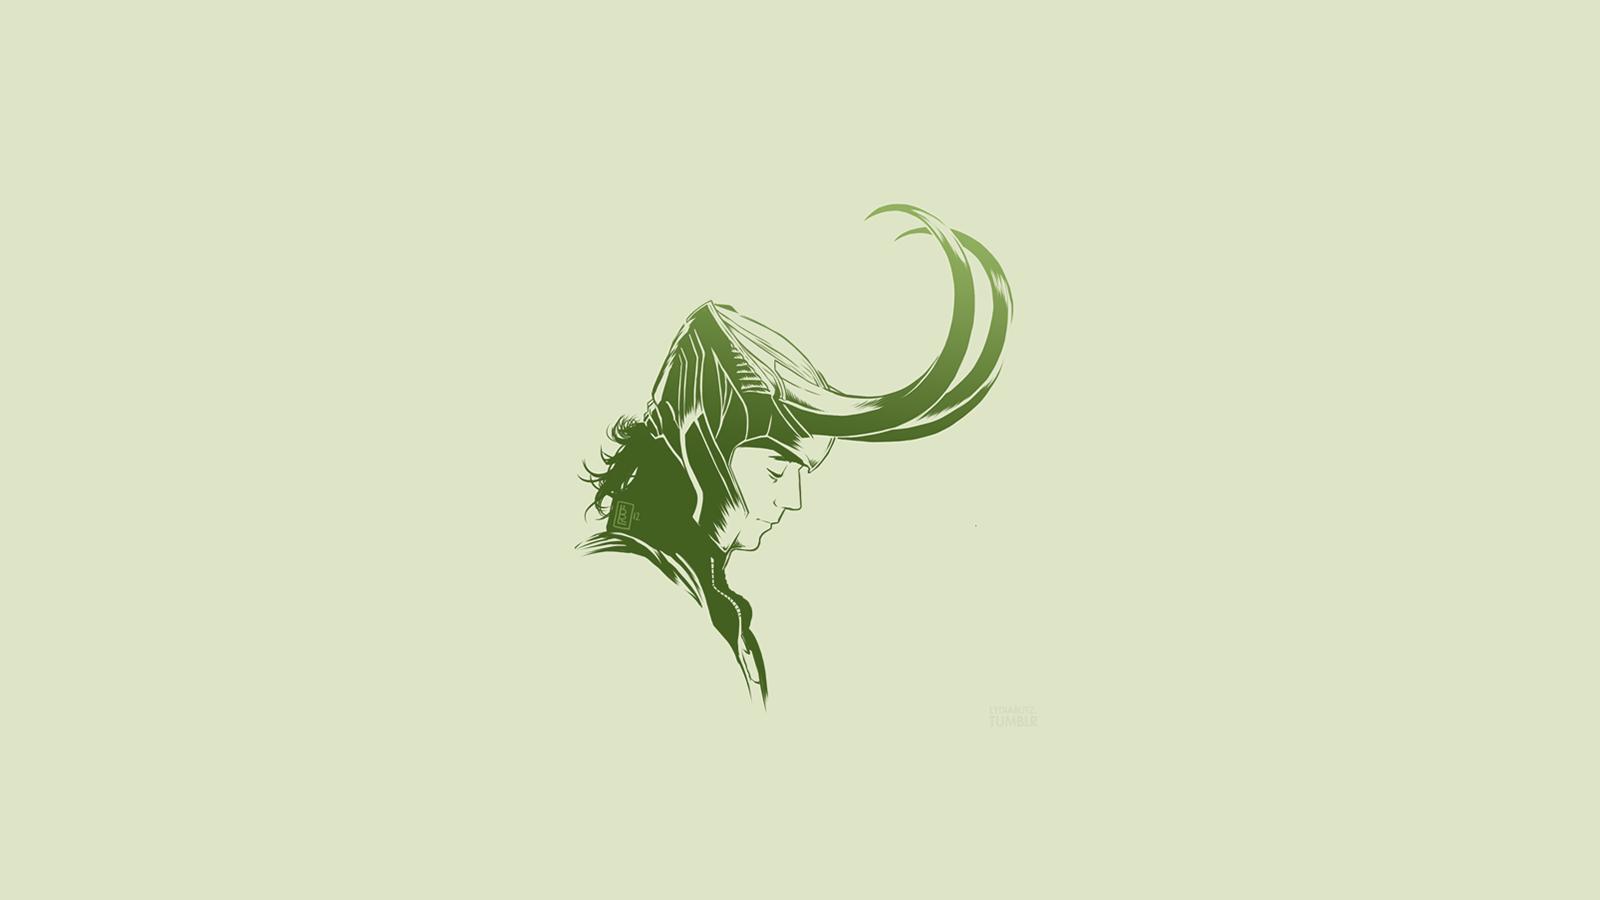 minimalism simple background artwork loki thor